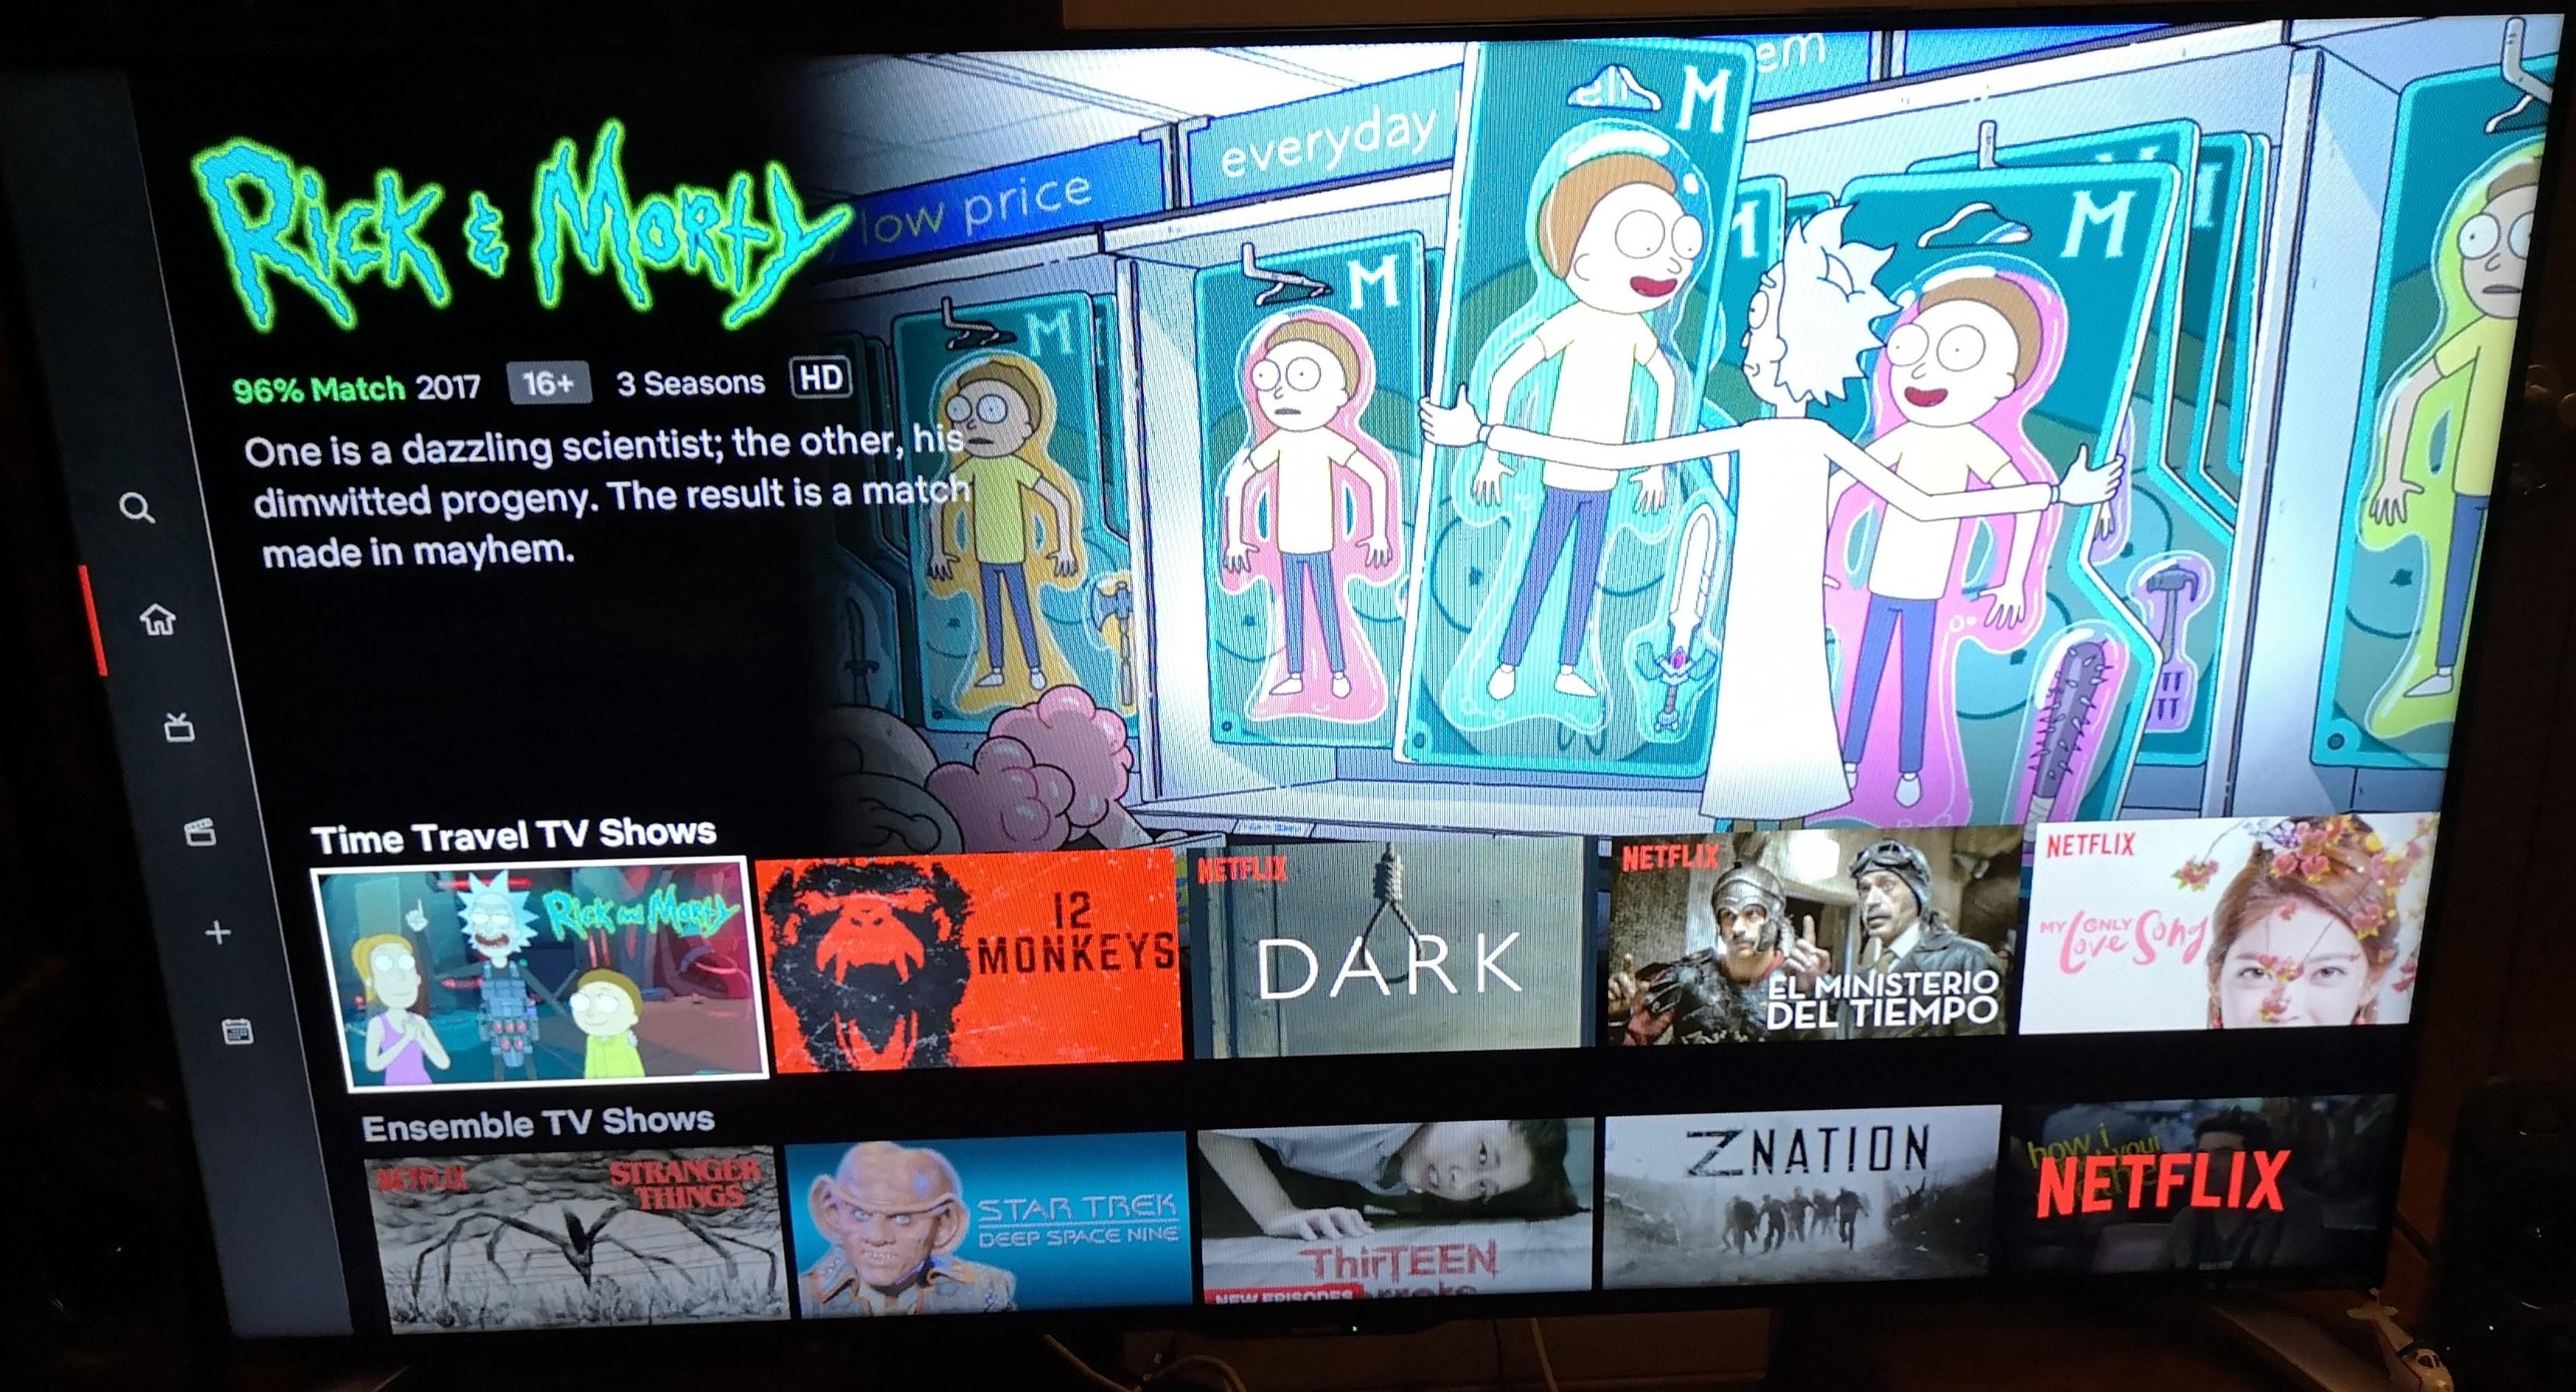 Netflix Has Categorize Rick Morty Under Time Travel Tv Shows P Rickandmorty Rick Picklerick Morty Wubbal Time Travel Tv Shows Rick And Morty Morty